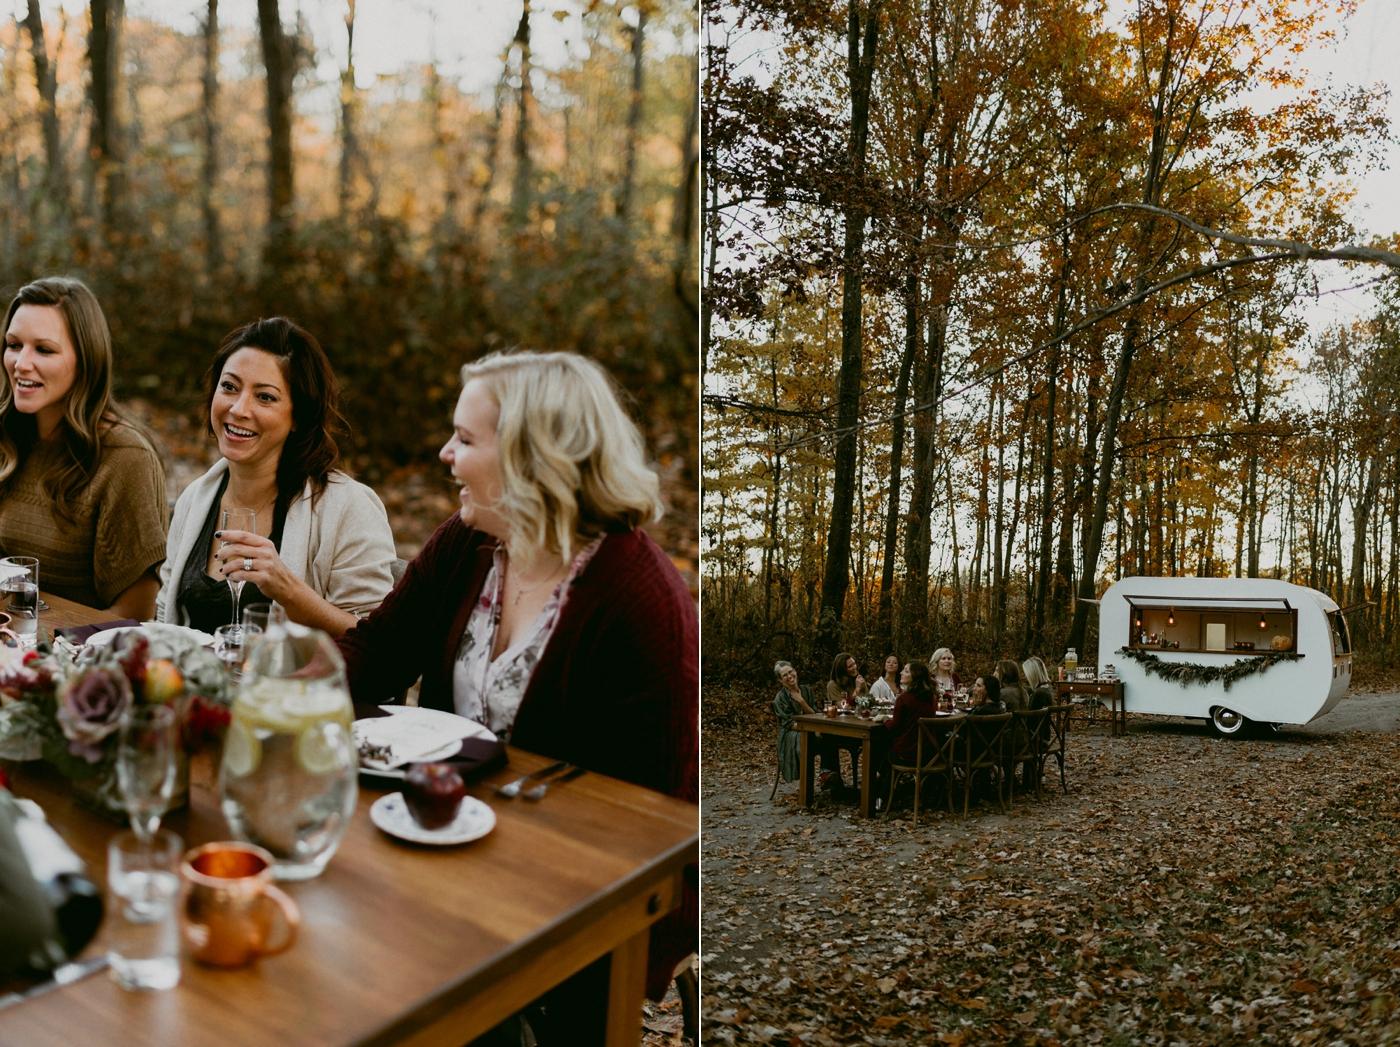 Autumn-Bridal-Shower-Vintage-Caravan-Styled-Shoot_MJPHOTO-102.jpg